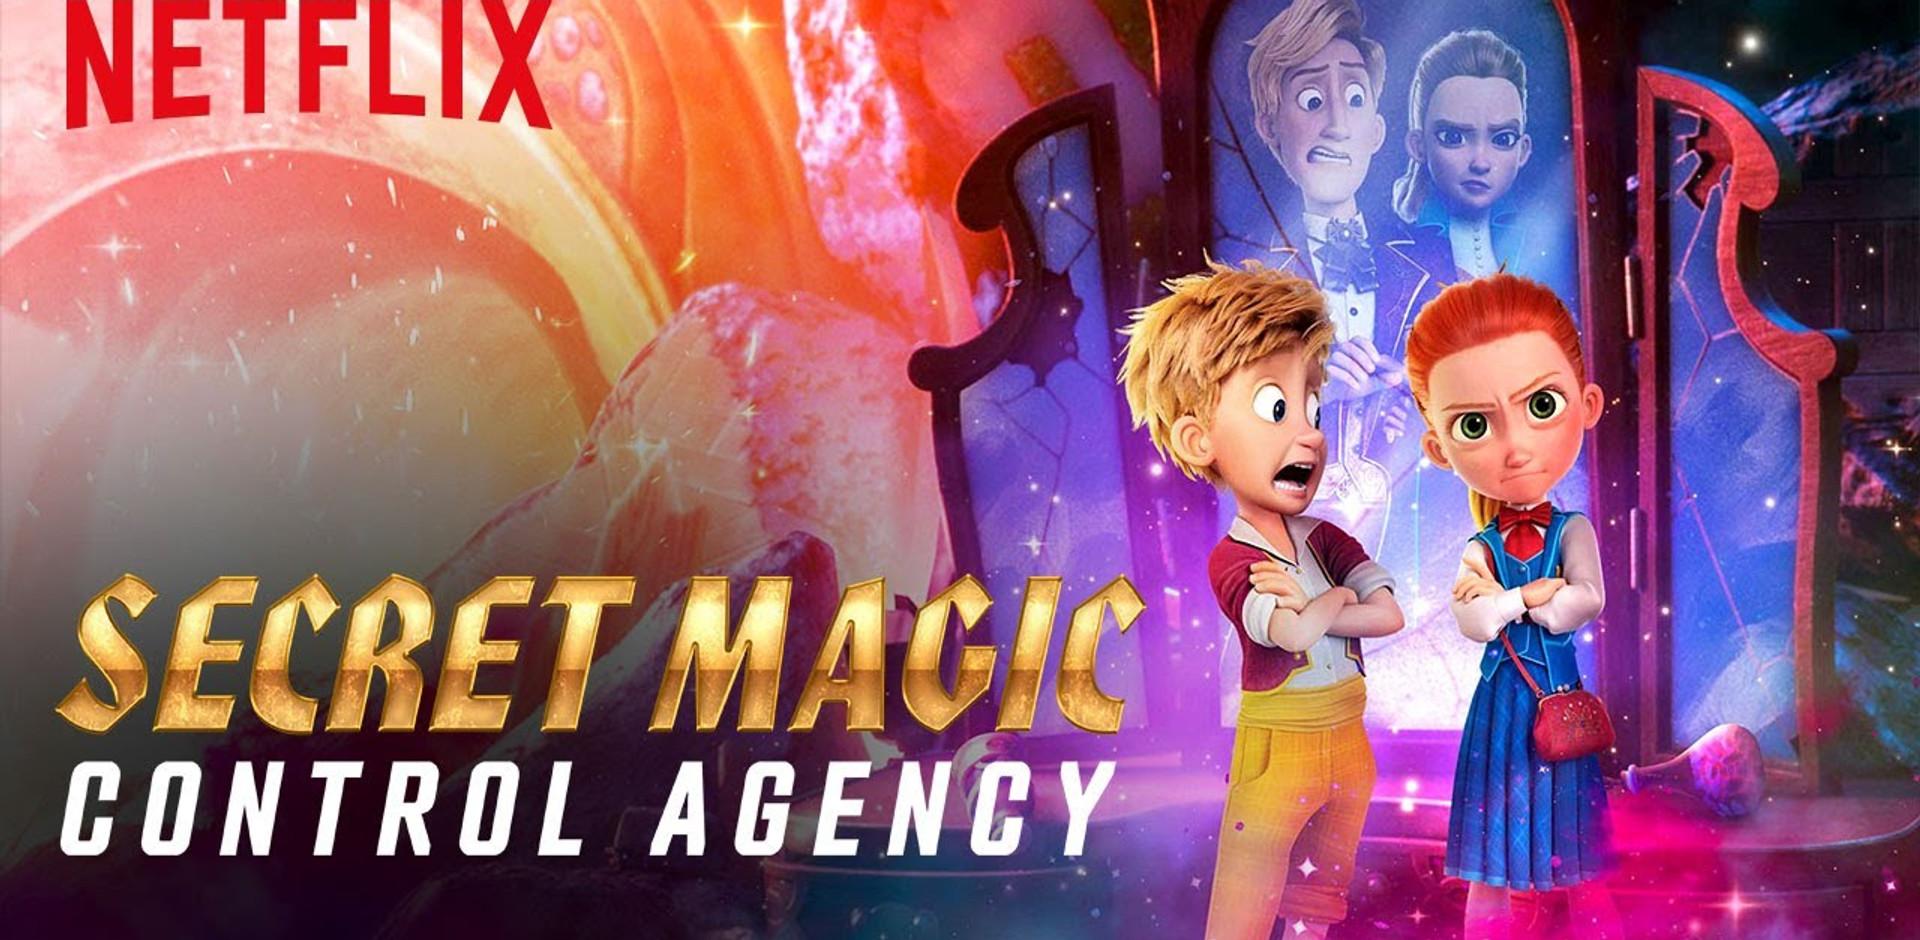 Nick as Hansel in Netflix's Secret Magic Control Agency